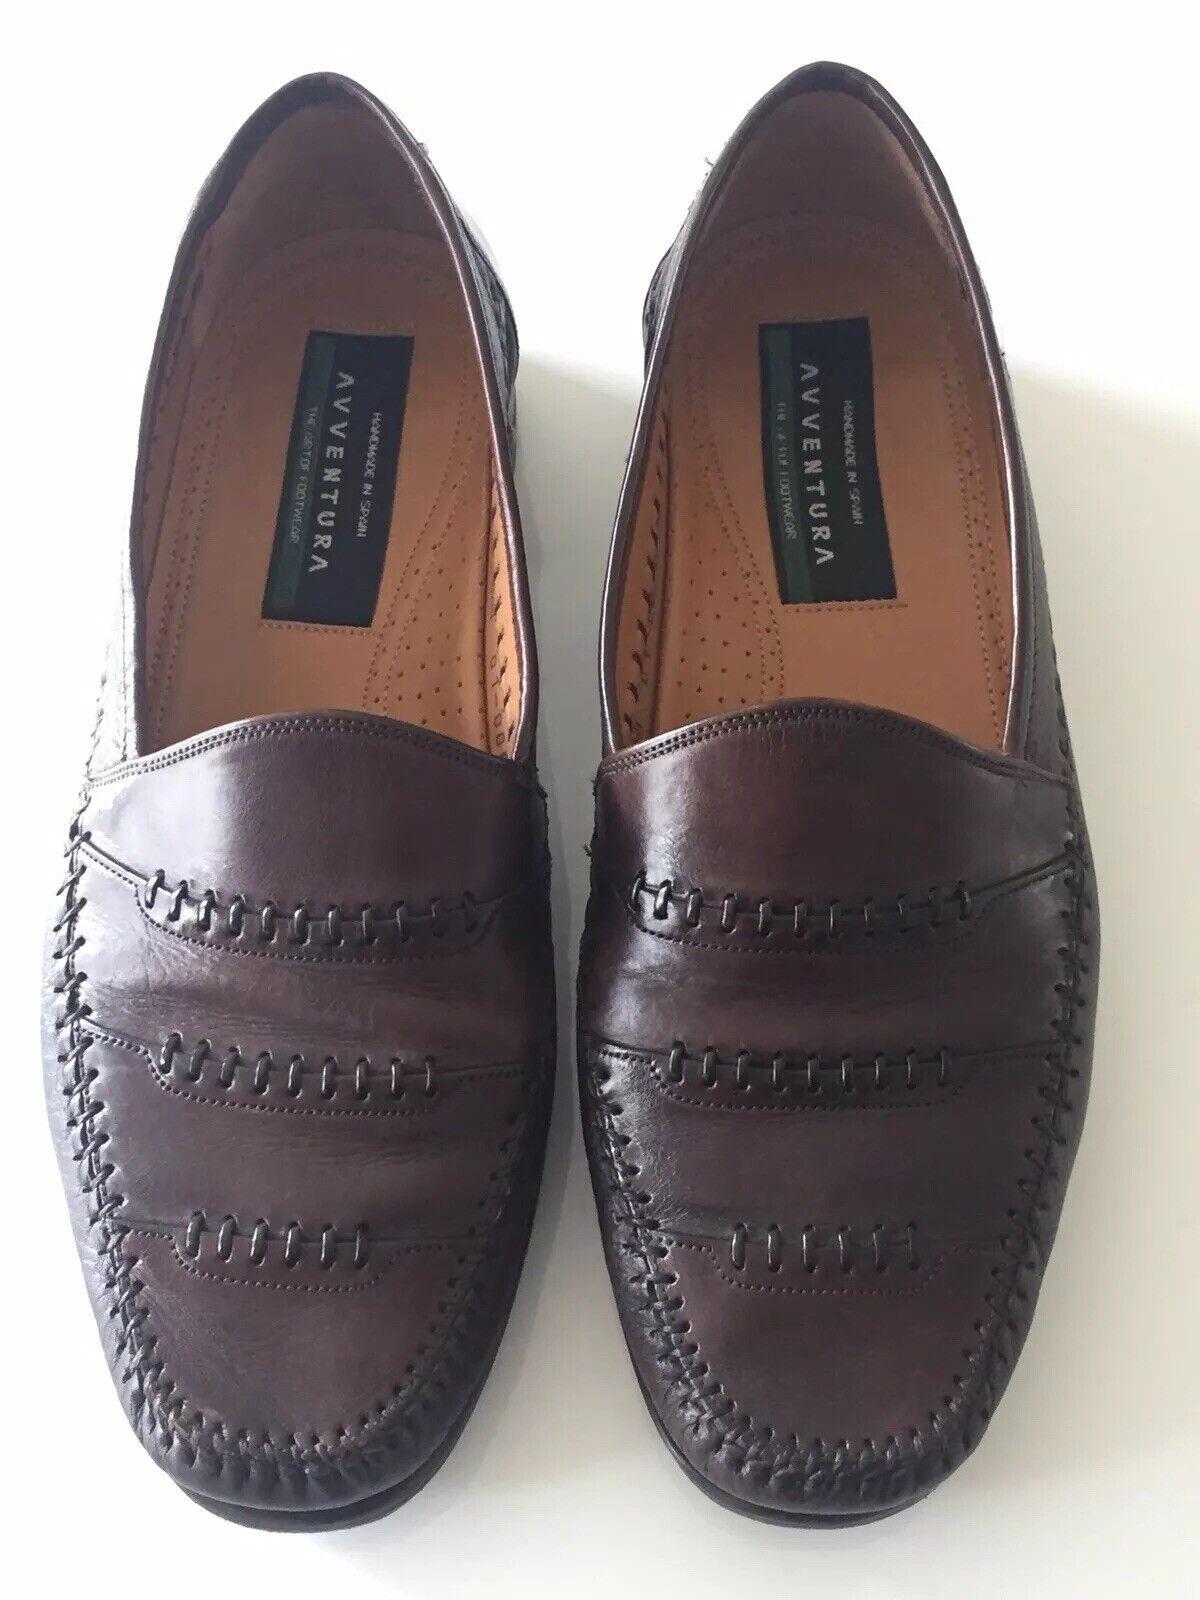 AVVENTURA AVVENTURA AVVENTURA Dark braun Leather Loafer schuhe - Spain Sz 9 M 236205